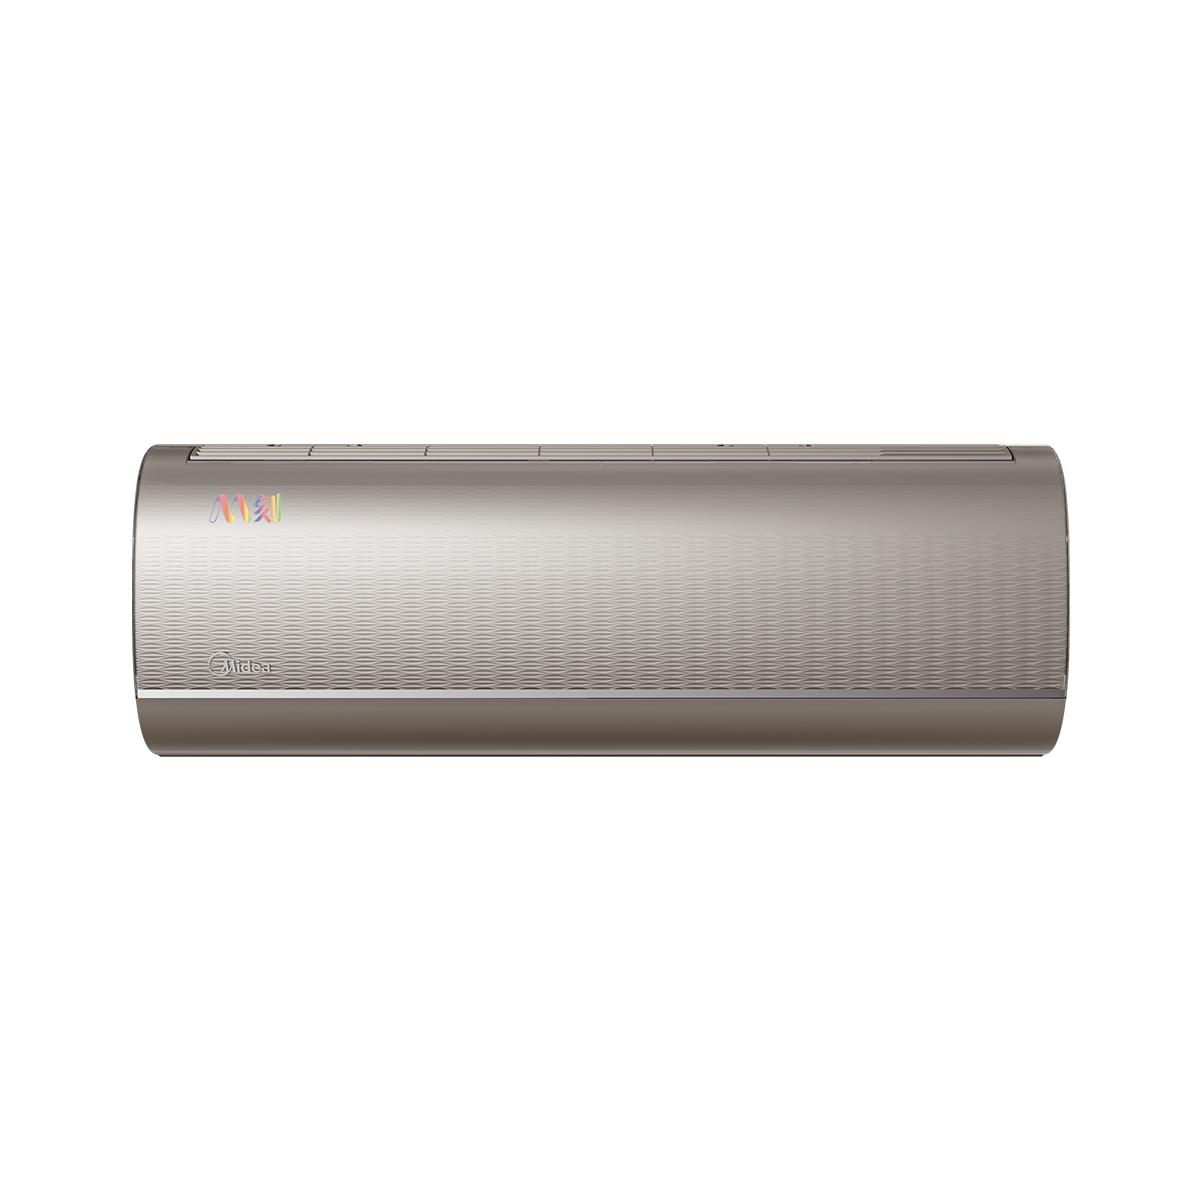 Midea/美的 KFR-35GW/BP3DN8Y-YA100(B1)家用空调套机 说明书.pdf